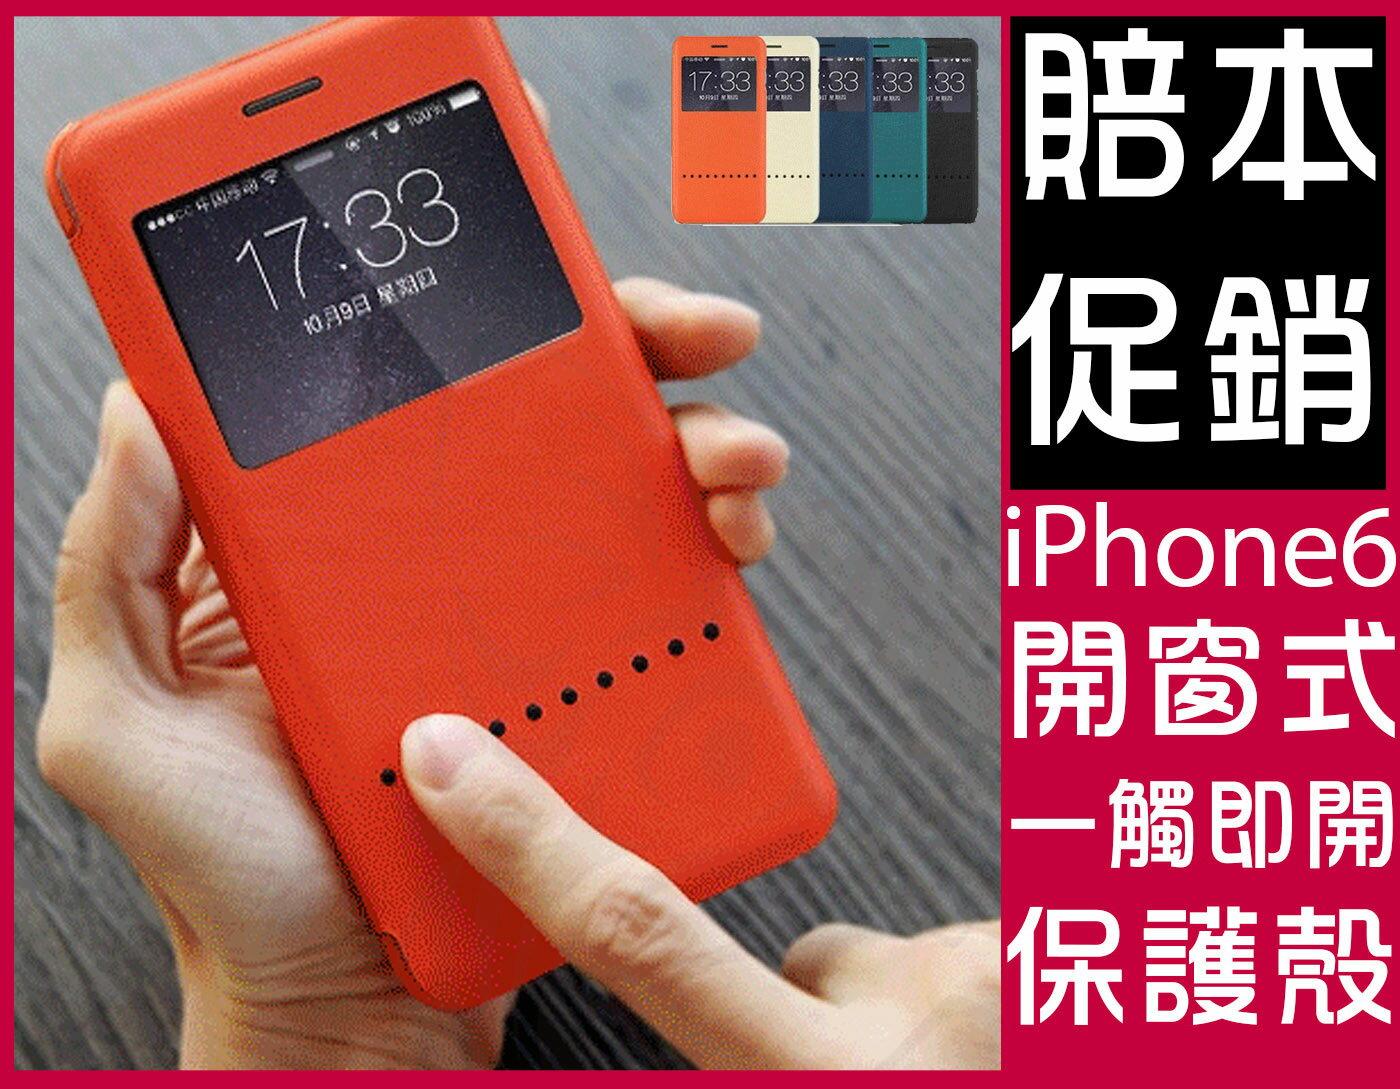 ROCK iPhone 6 觸控保護套【C-I6-026】捷觸系列 視窗手機套 4.7吋 Alice3C - 限時優惠好康折扣